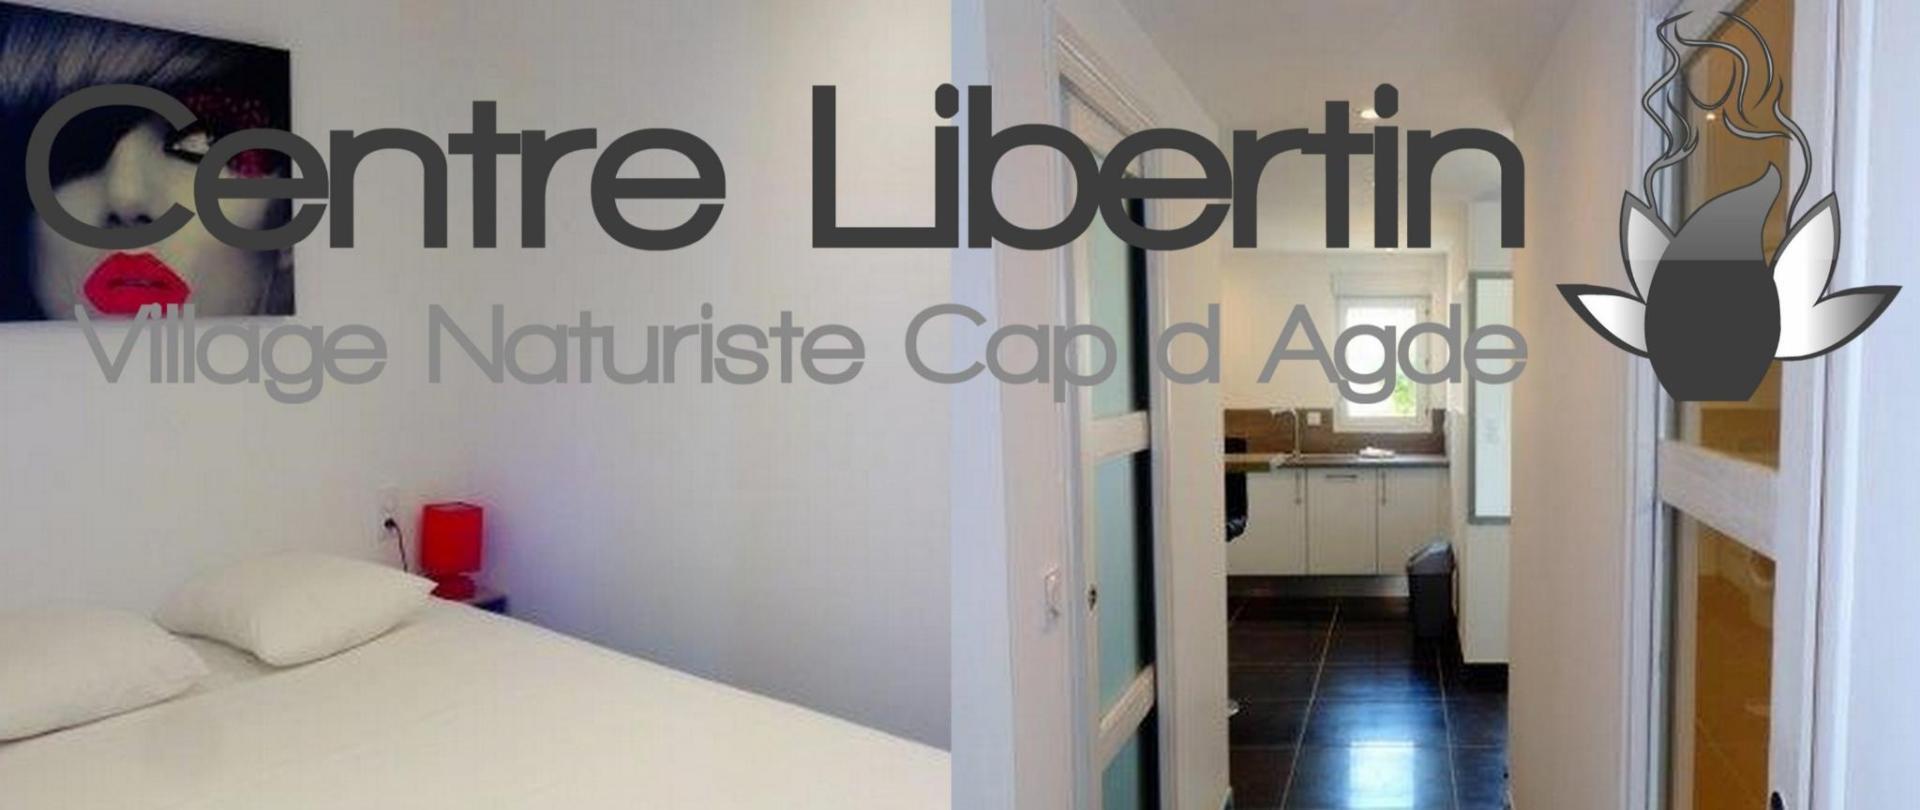 Centre Libertin R5 10 (3000x2121).jpg